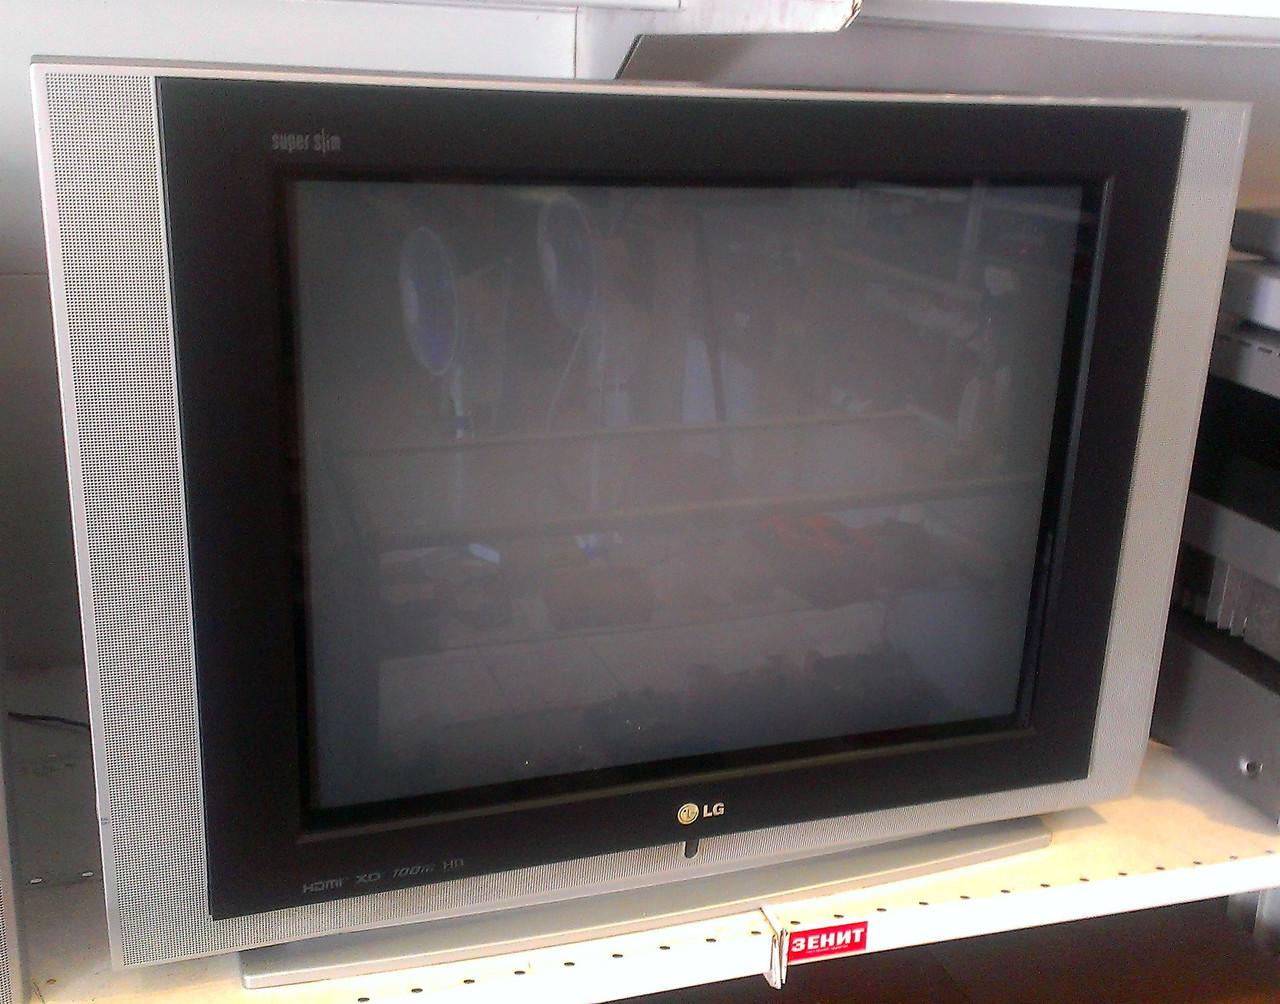 "Архив 29"" UltraSlim 100 герцовый с HDMI разъемом телевизор LG 29FS6RNX: 2 000 грн. - Телевизоры Мариуполь на BESPLATKA.ua 64843818"